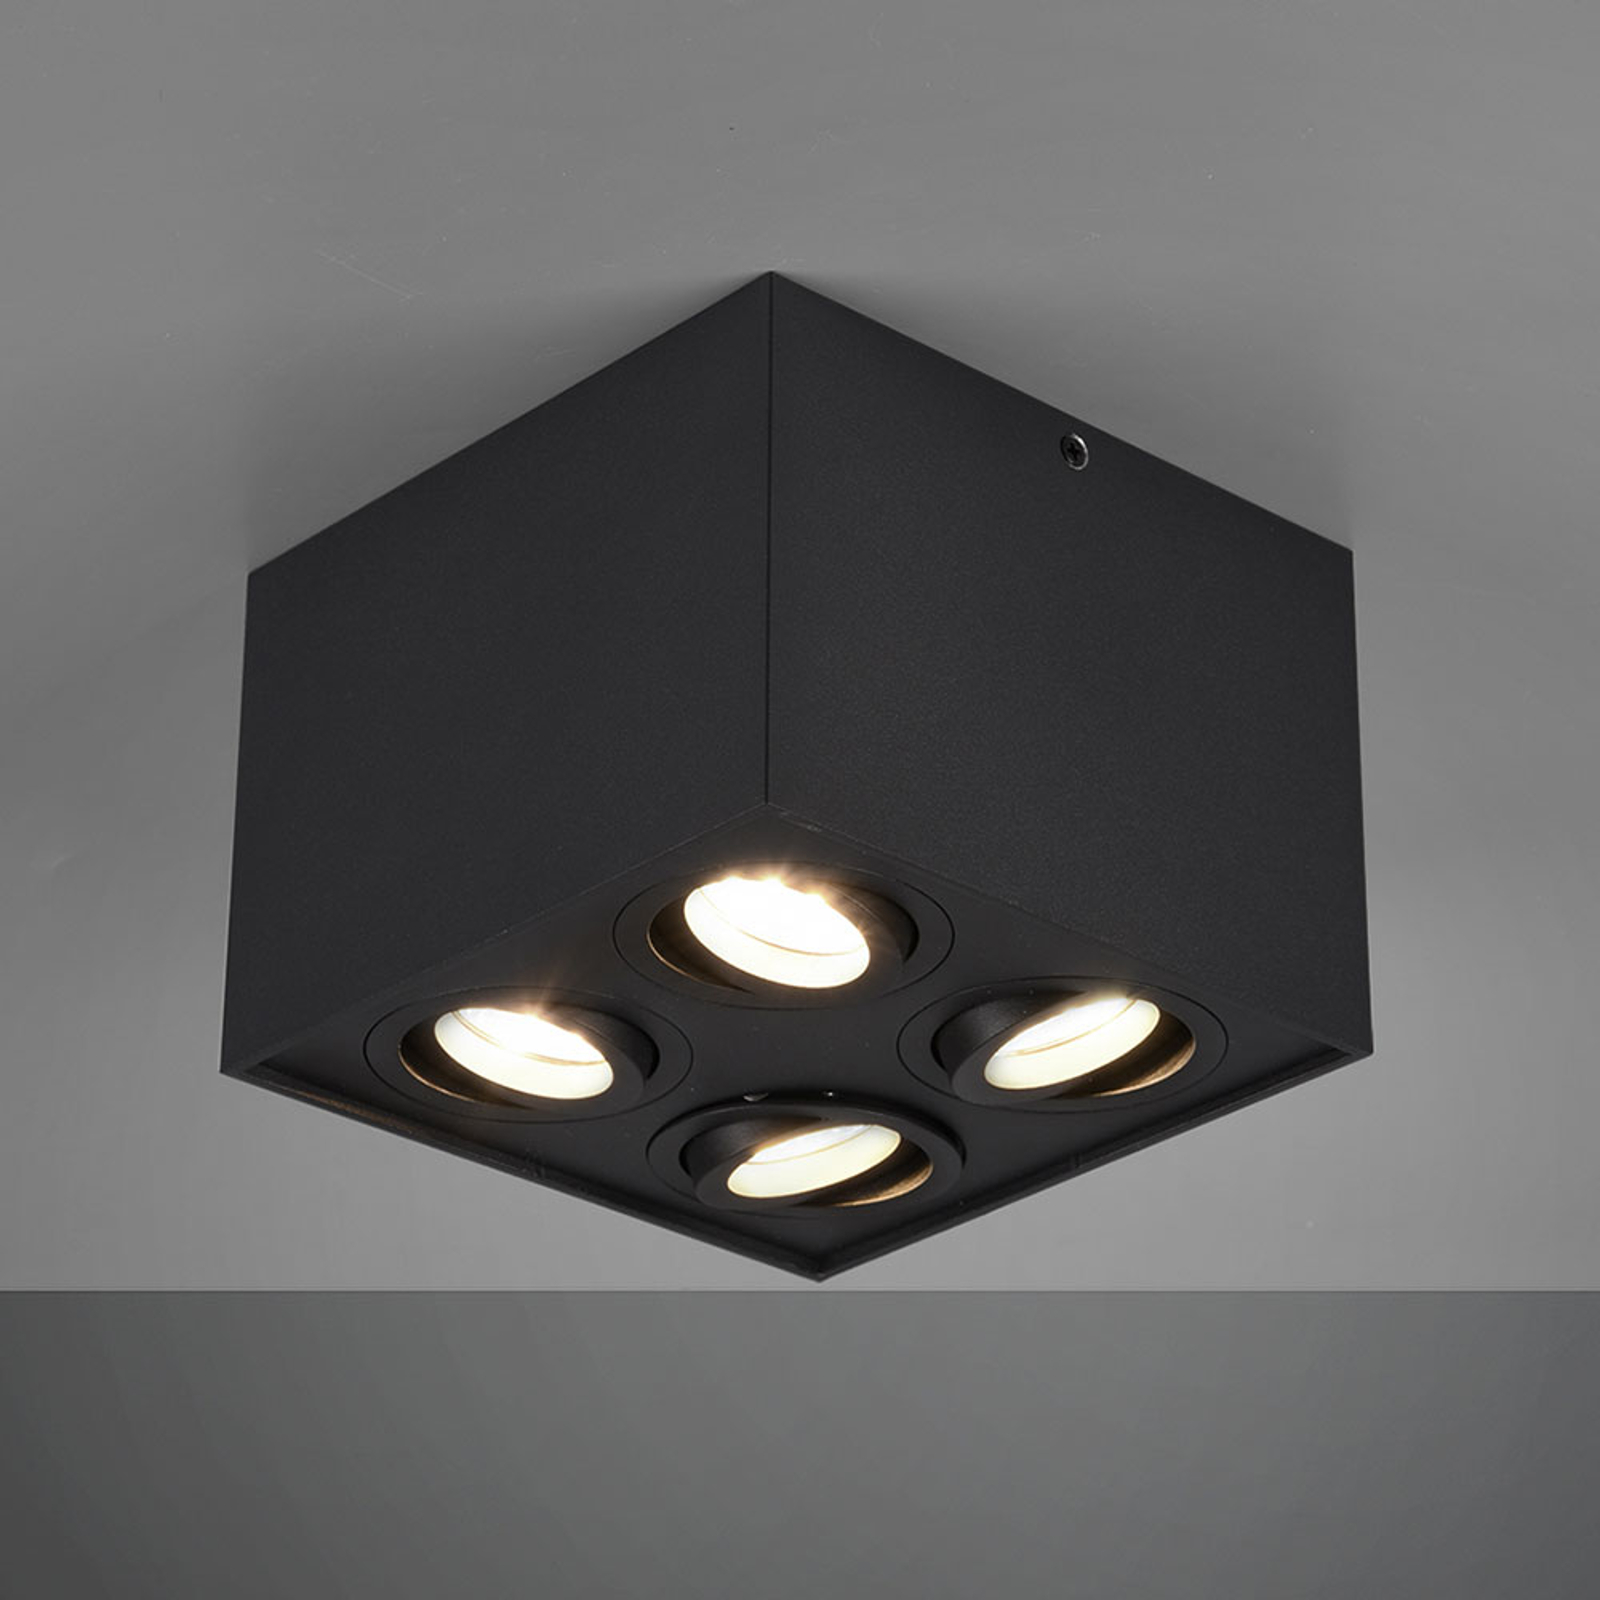 Lampa sufitowa Biscuit, 4-punktowa, czarna